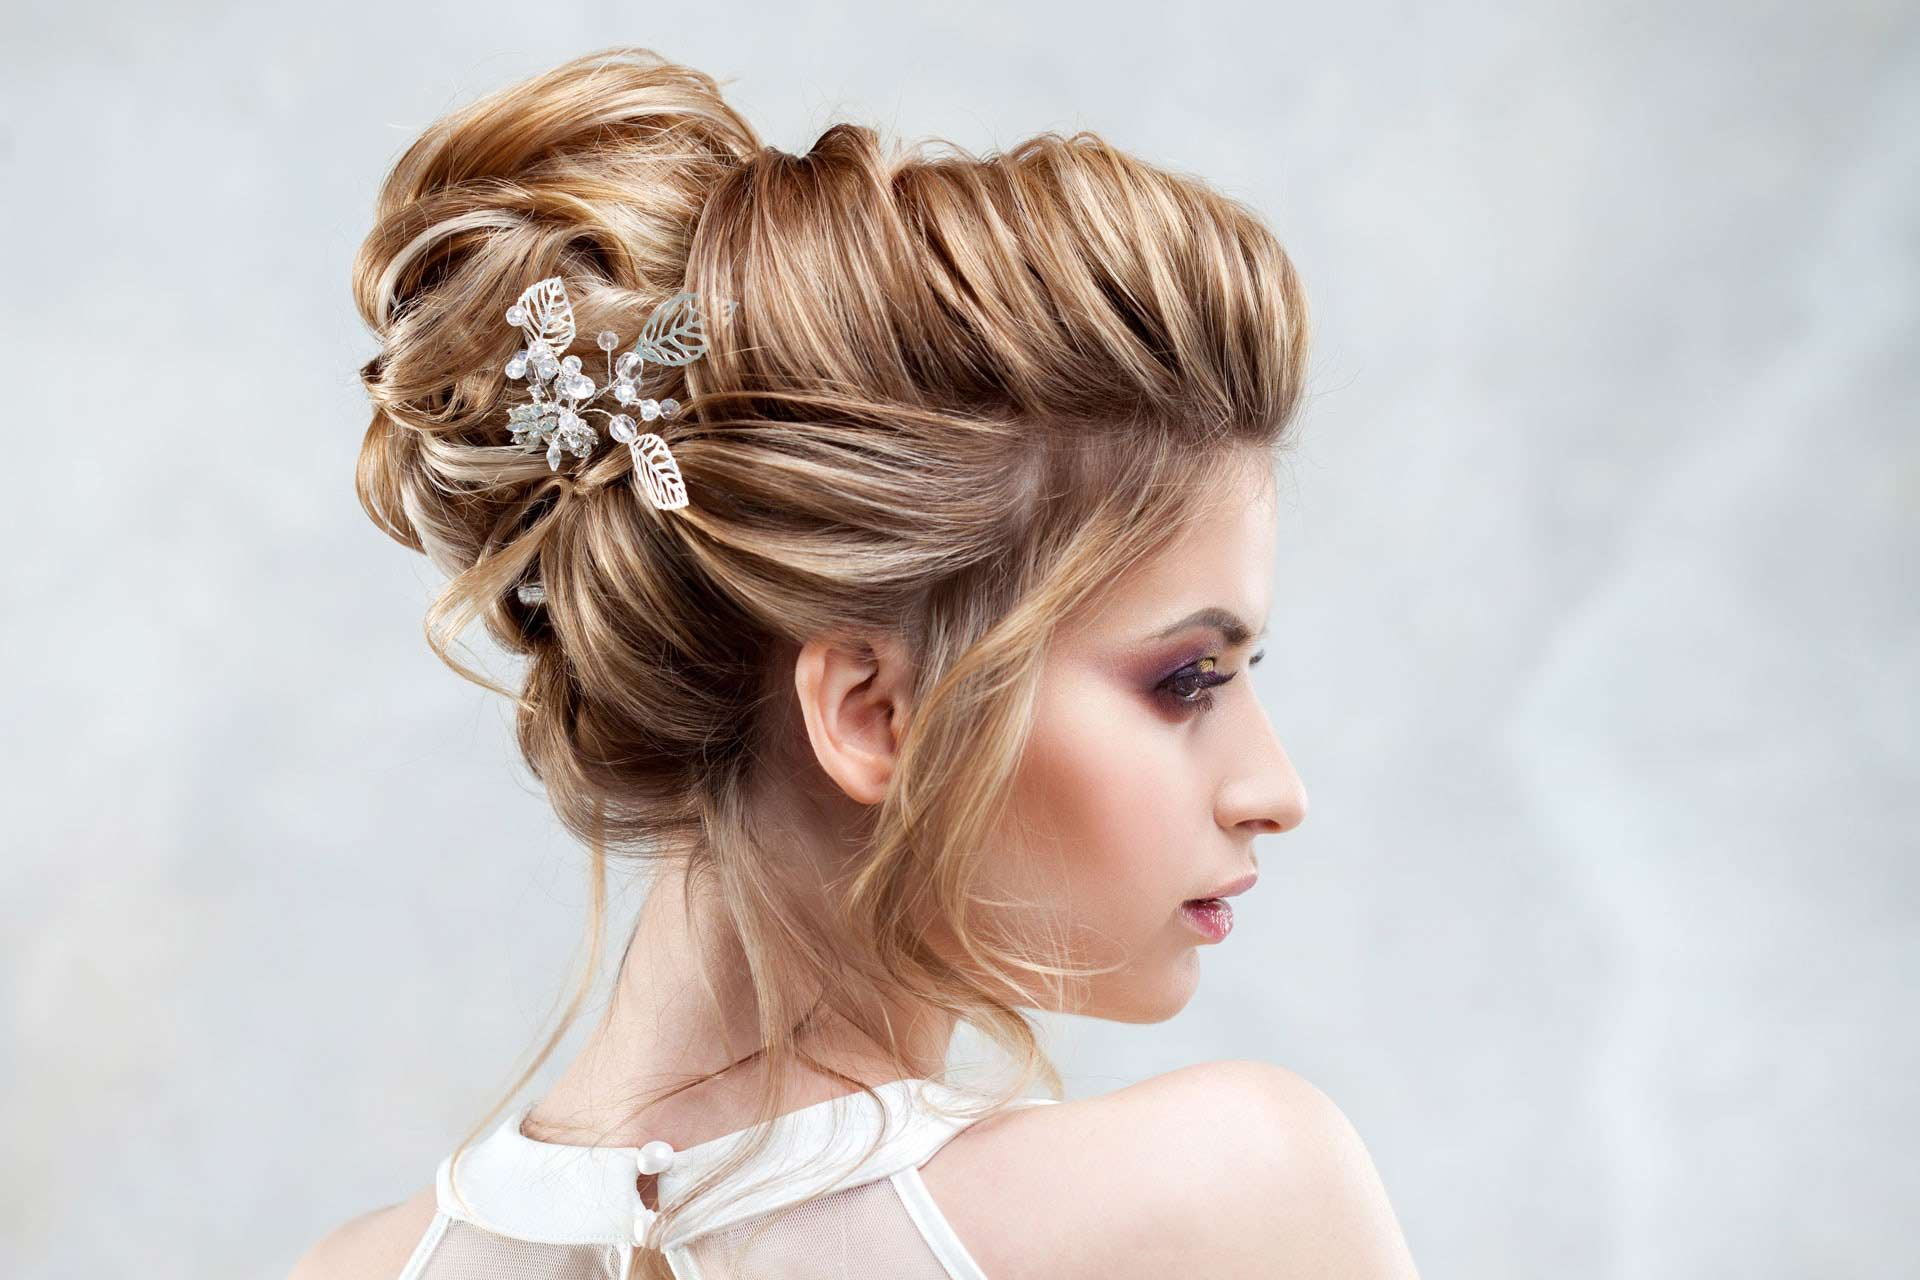 Best Of Wedding Makeup Orlando Fl And Description In 2020 Wedding Hair And Makeup Bridal Hair And Makeup Hairdo